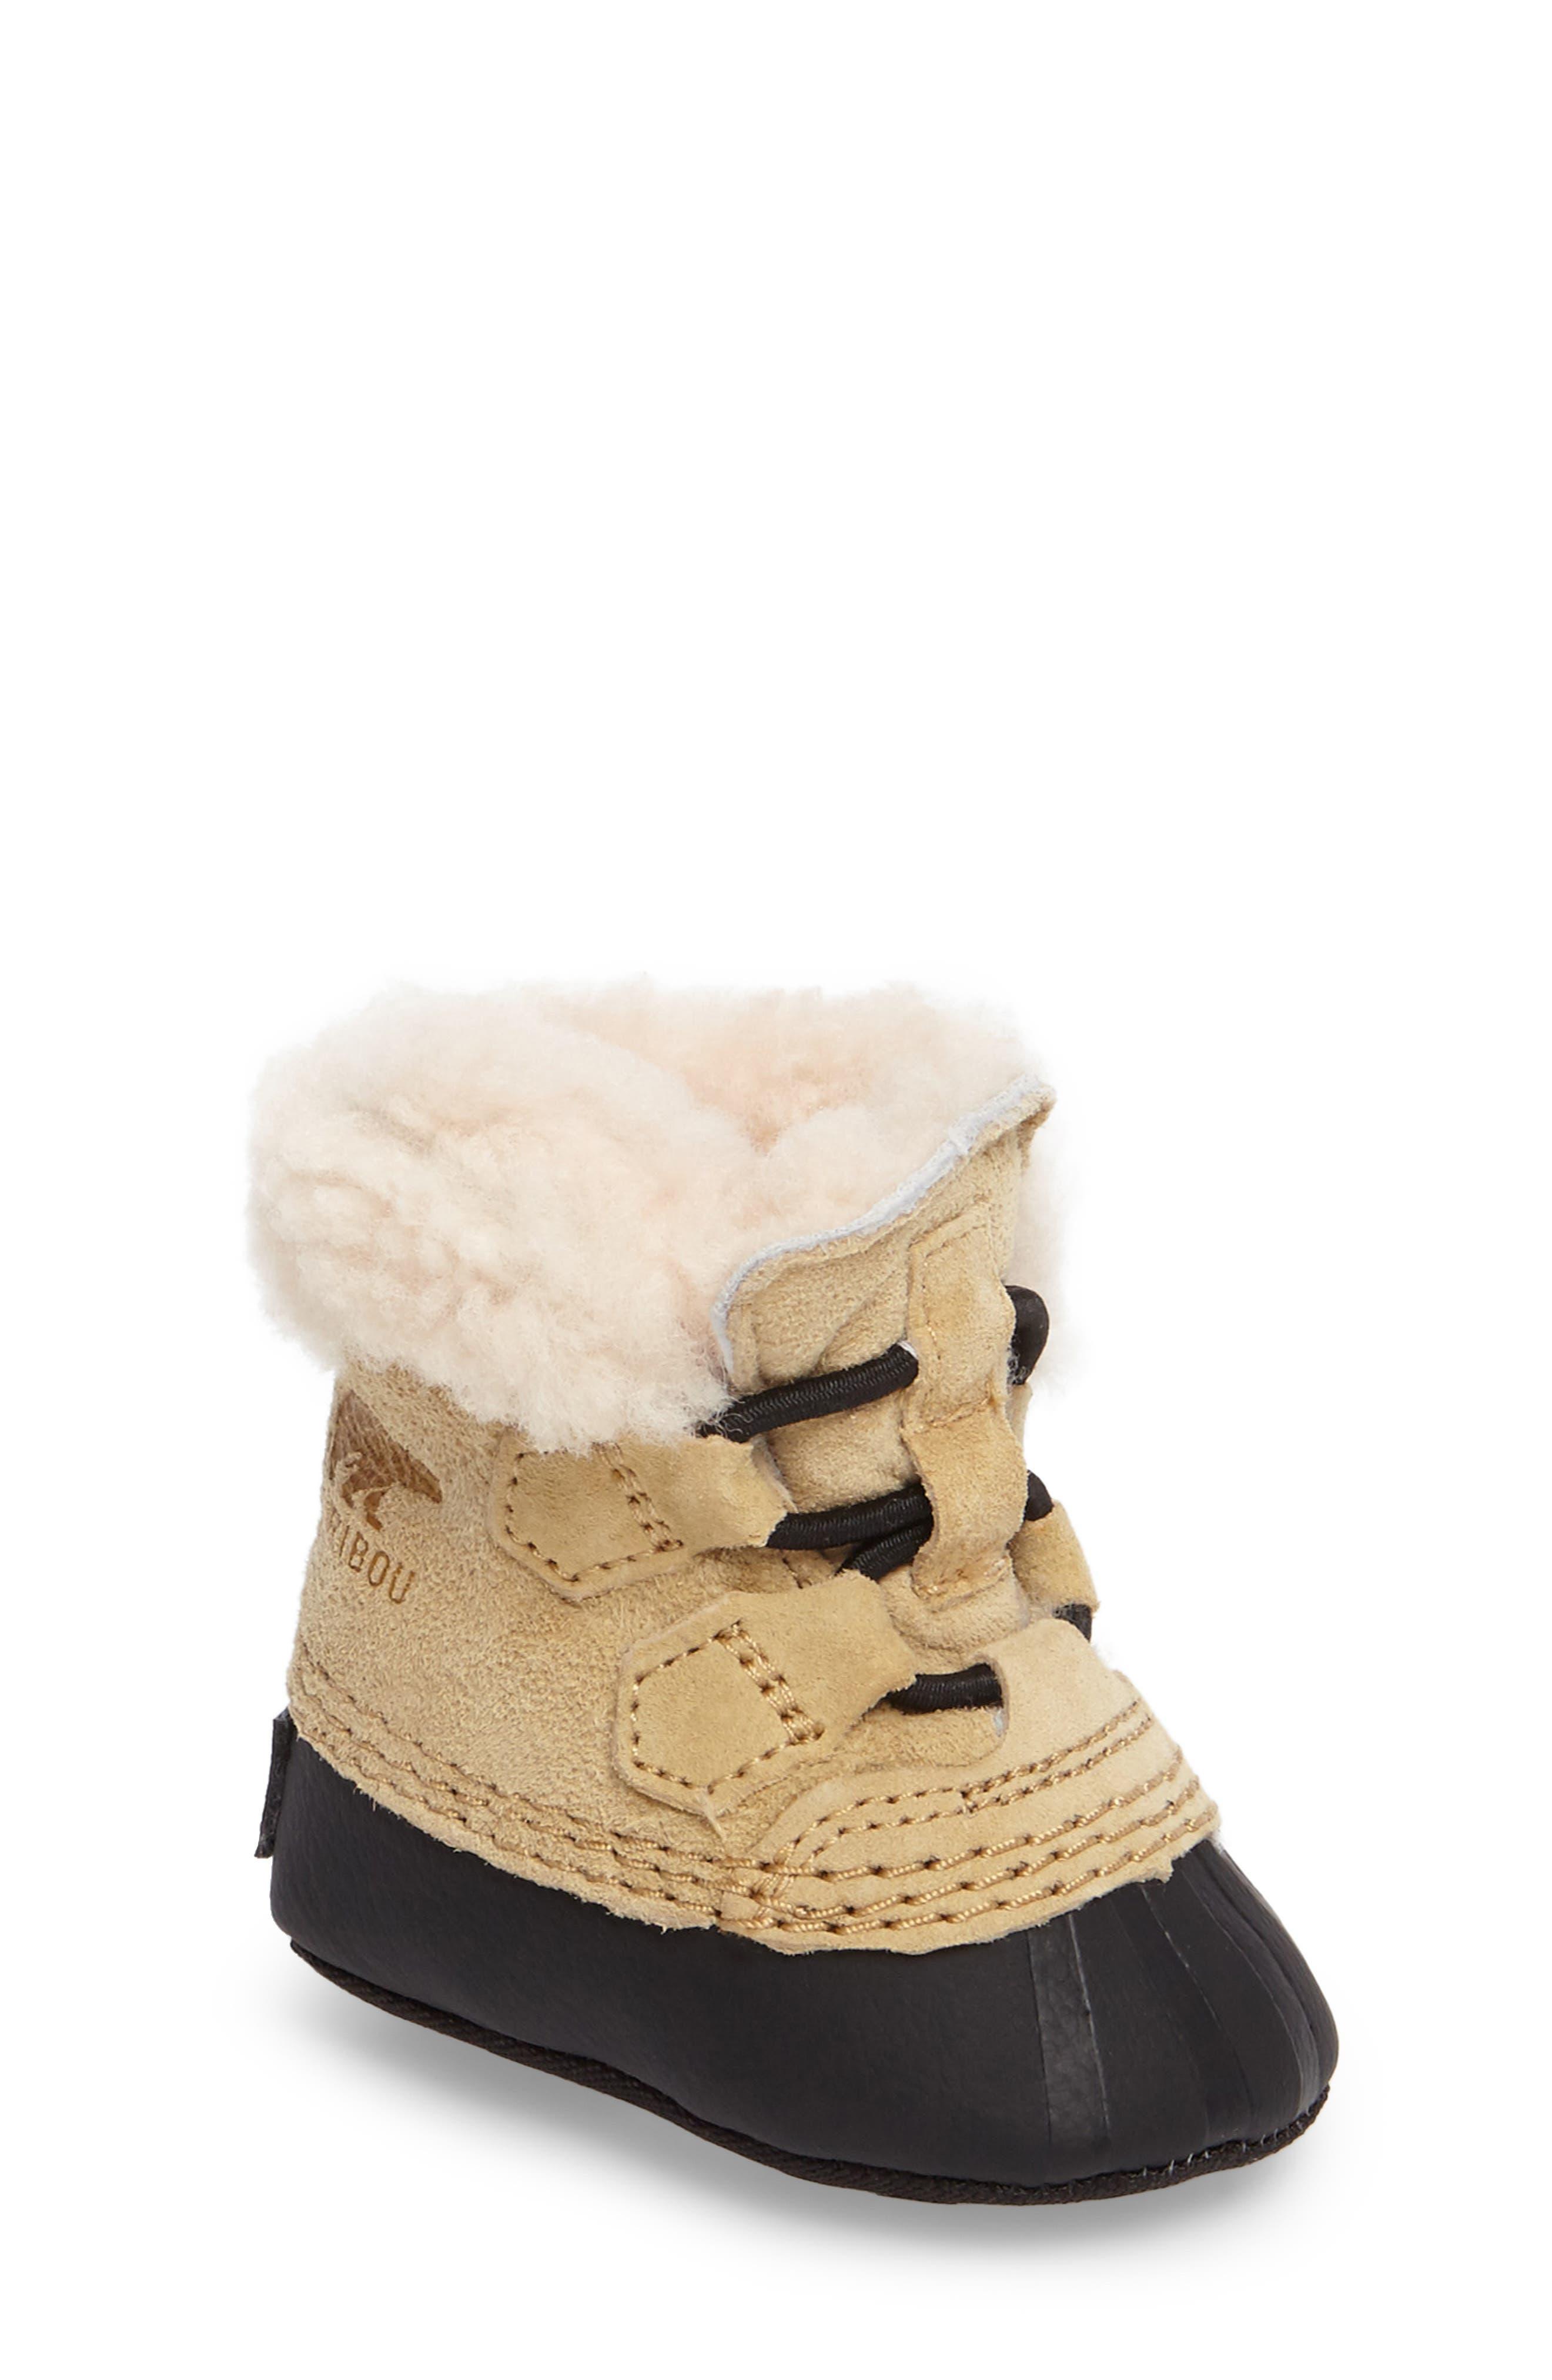 Main Image - SOREL Caribootie Genuine Shearling Crib Shoe (Baby)